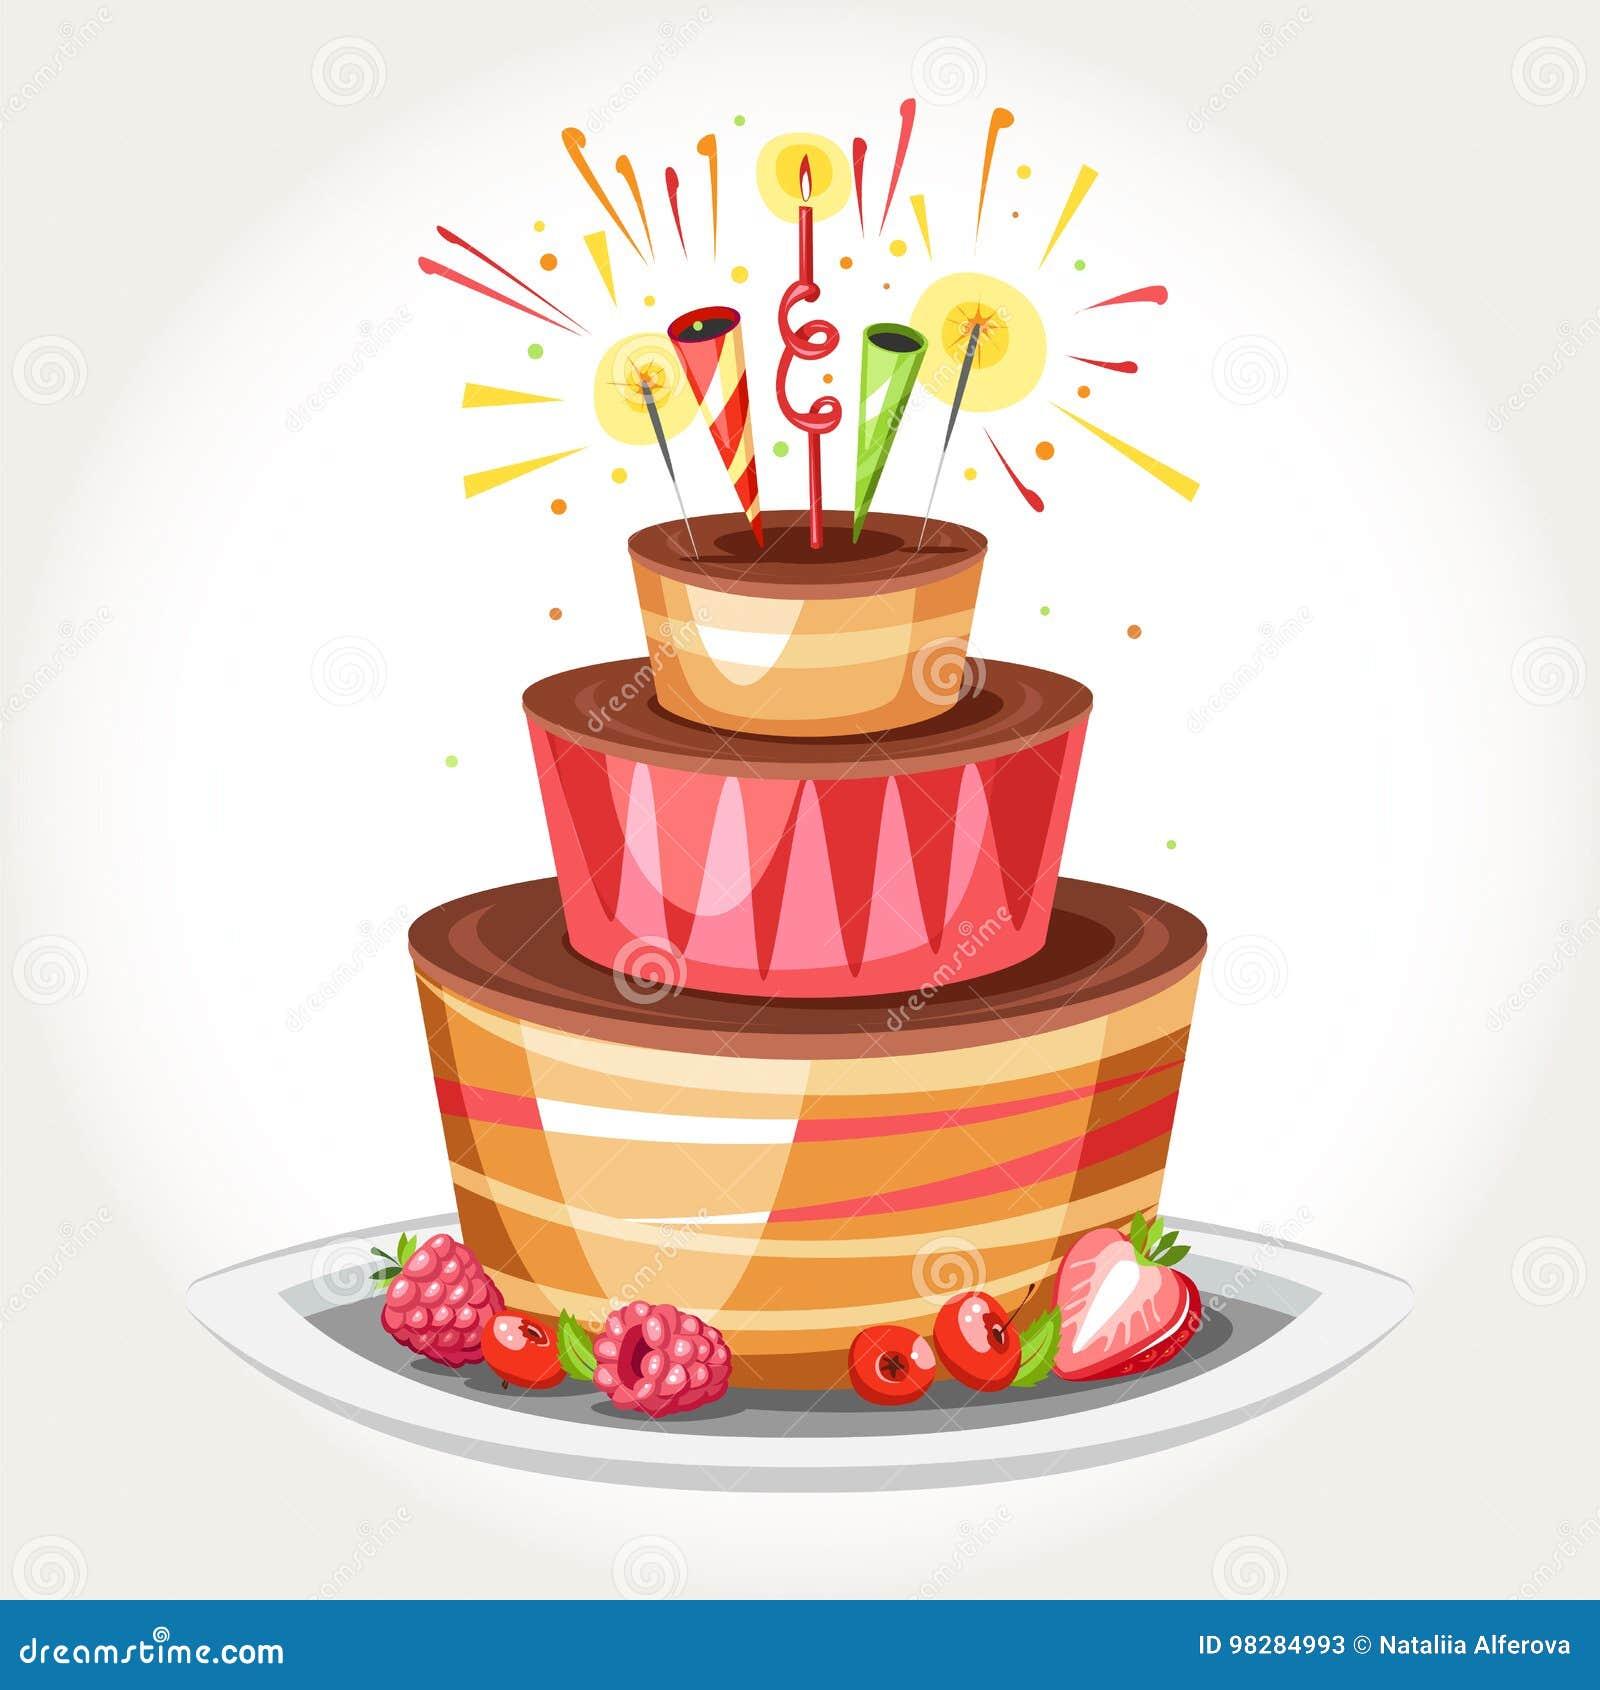 Stupendous Birthday Cake Stock Vector Illustration Of Anniversary 98284993 Funny Birthday Cards Online Bapapcheapnameinfo